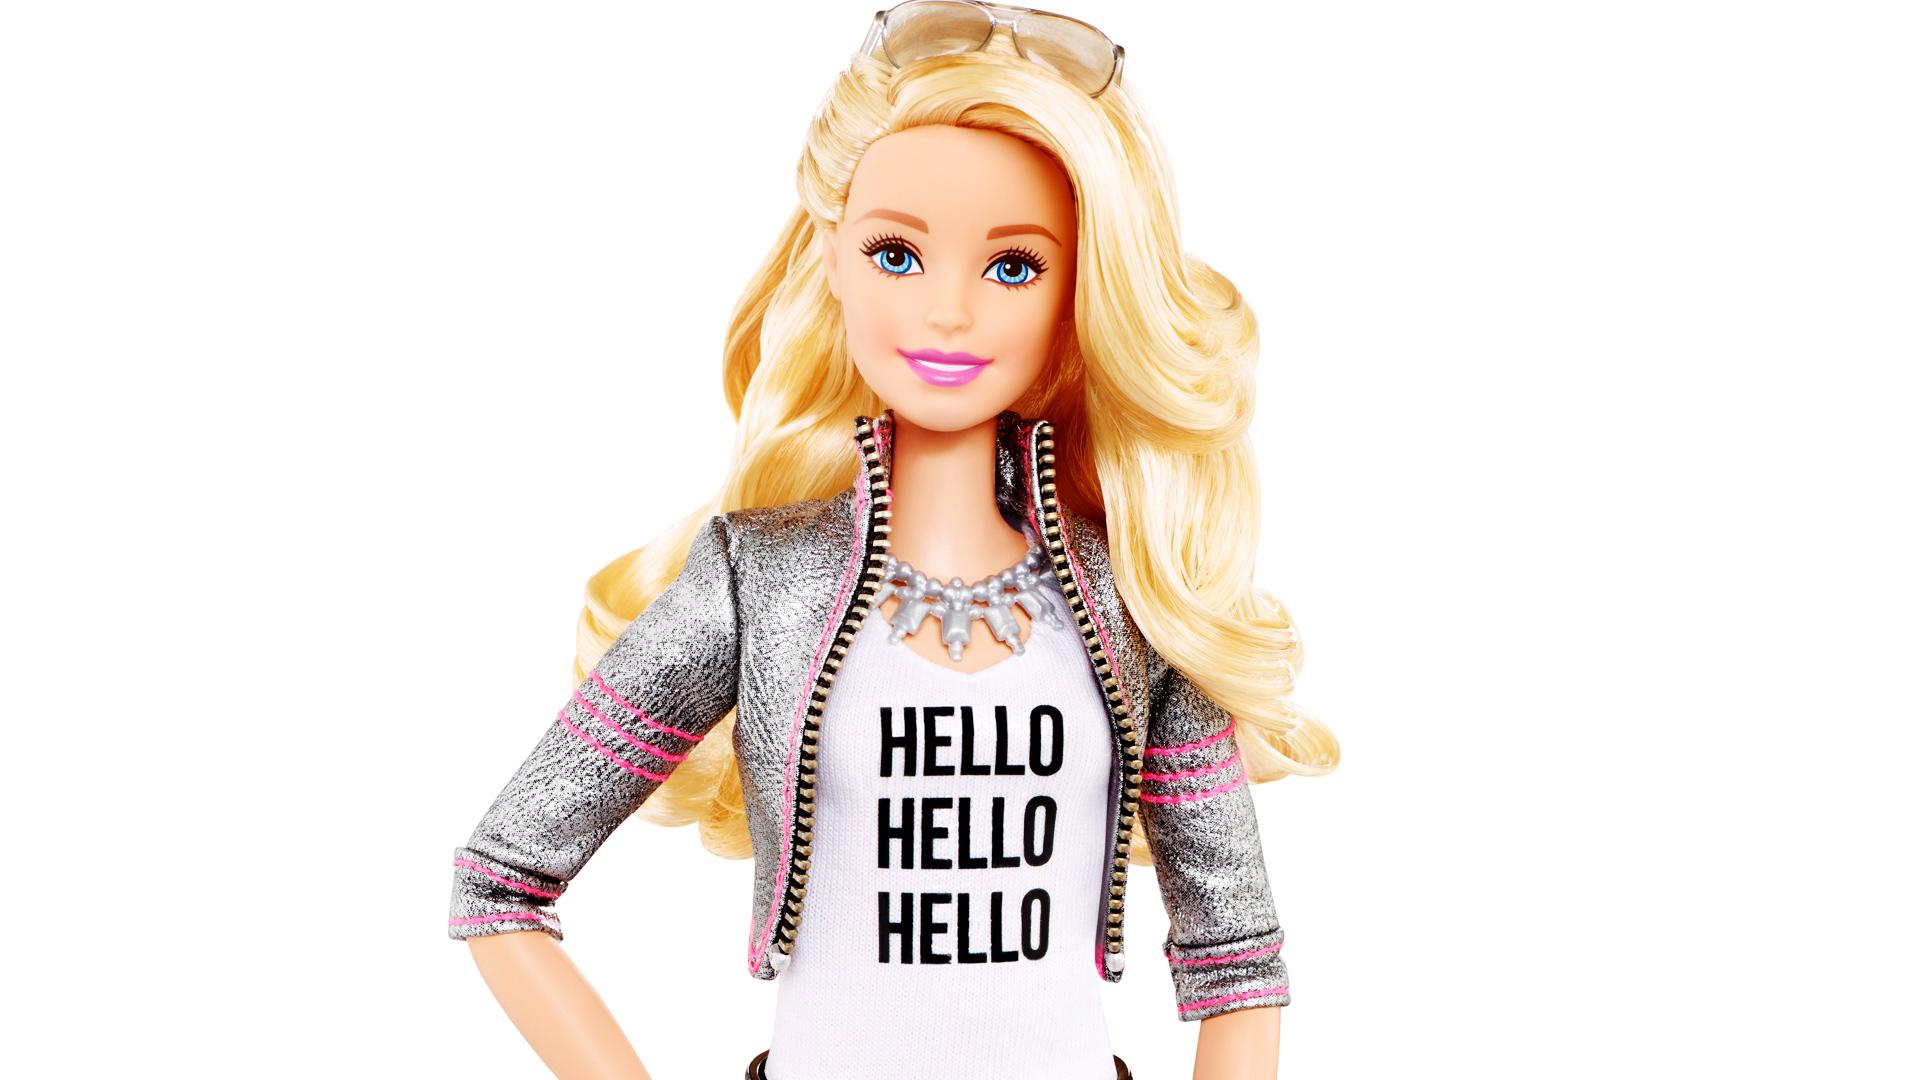 3042430-poster-p-1-hello-barbie-talking-toy-toytalk